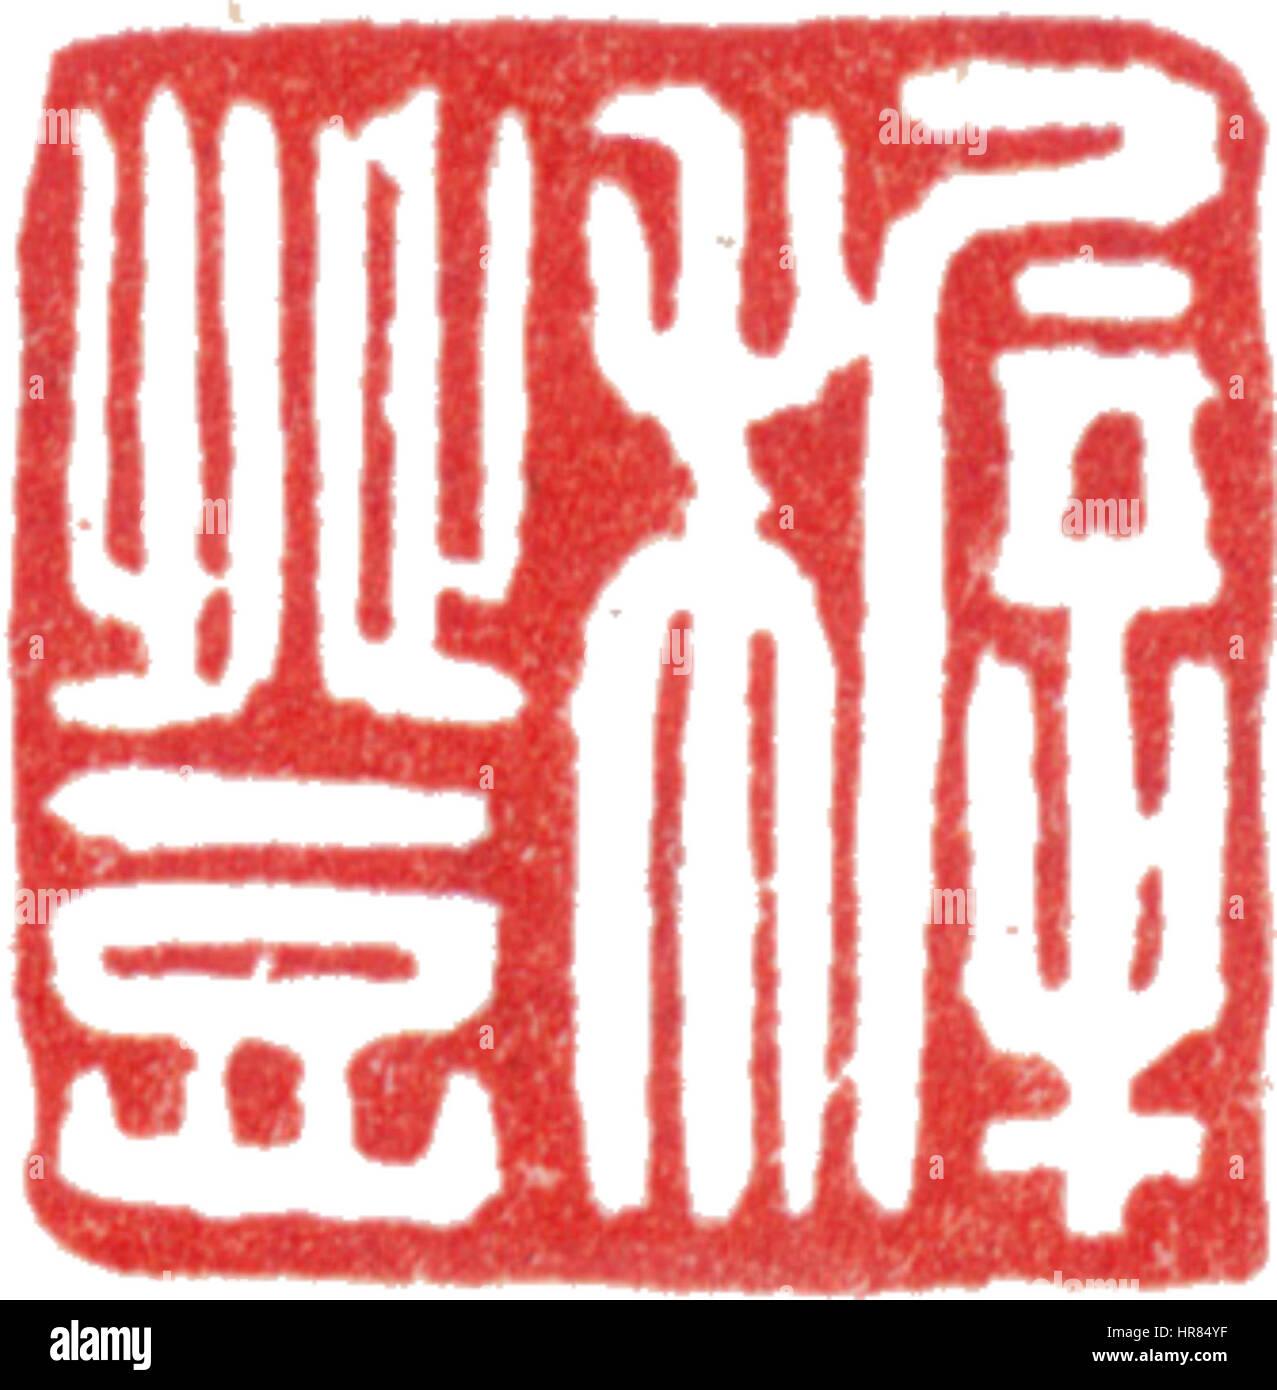 Wang Zhideng seals (given name stylised) - Stock Image